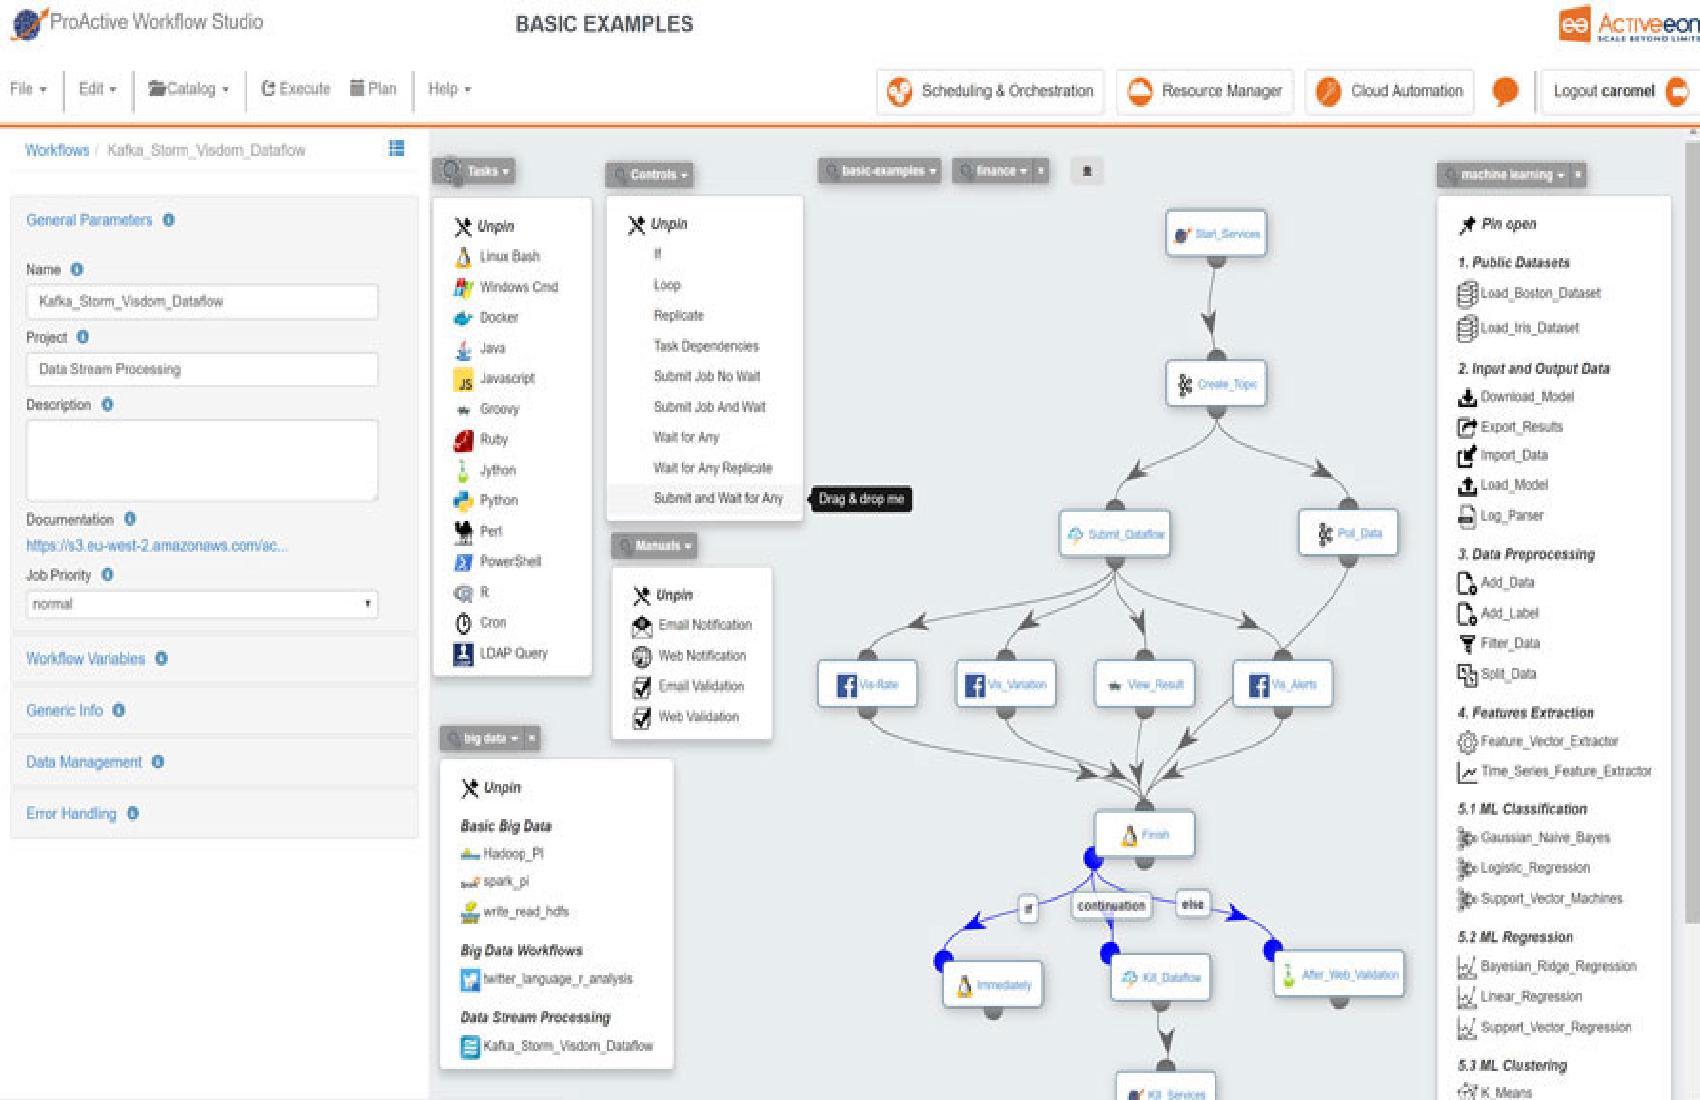 images/product-screenshots/bigdata-screenshot.jpg